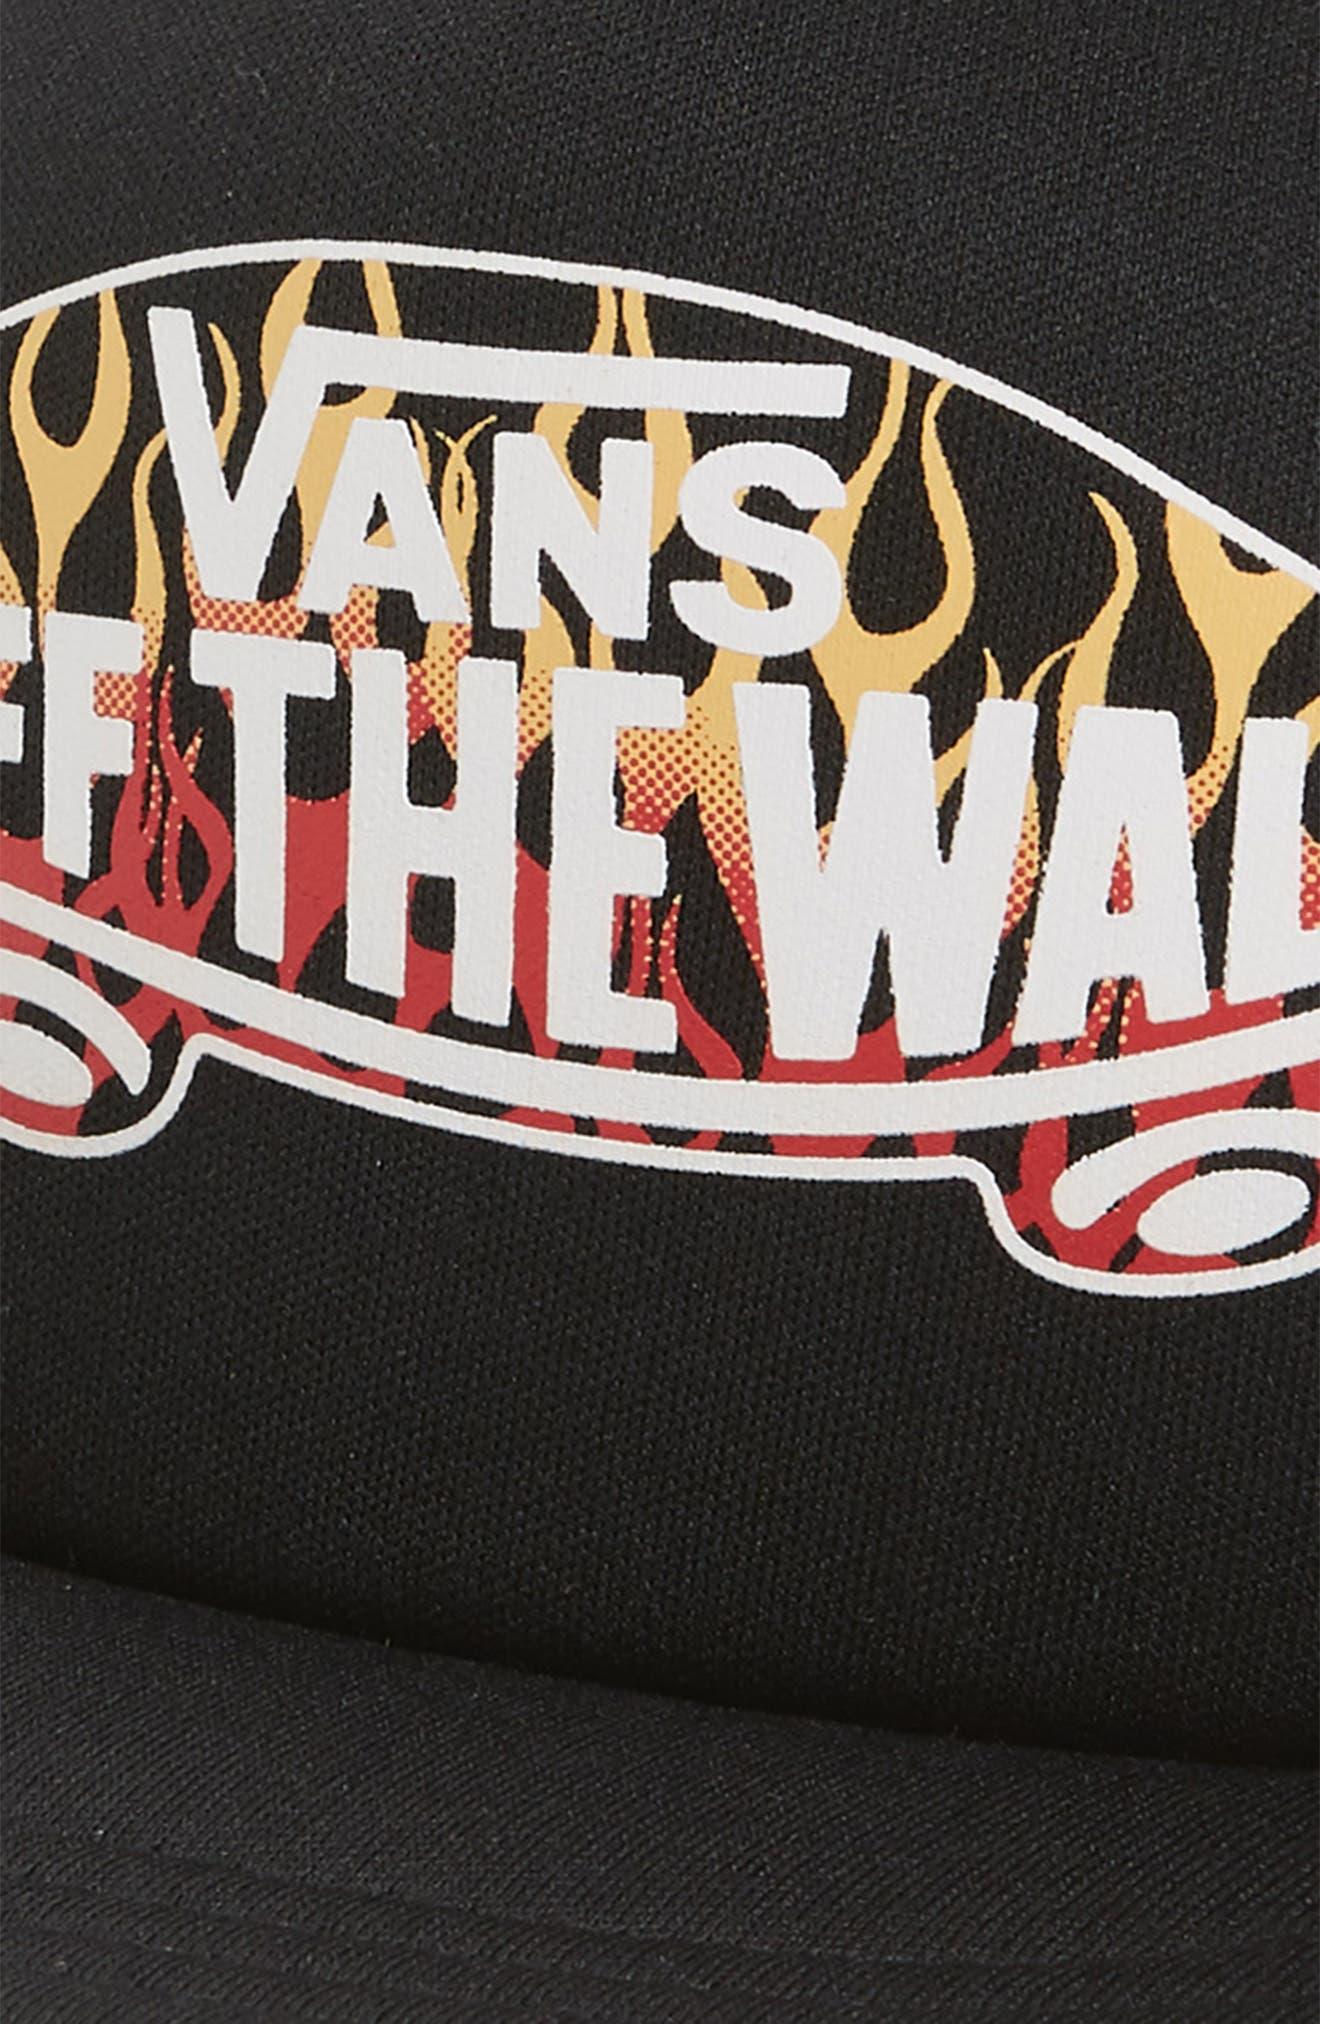 VANS,                             Classic Logo Print Trucker Hat,                             Alternate thumbnail 3, color,                             BLACK/ FLAMES